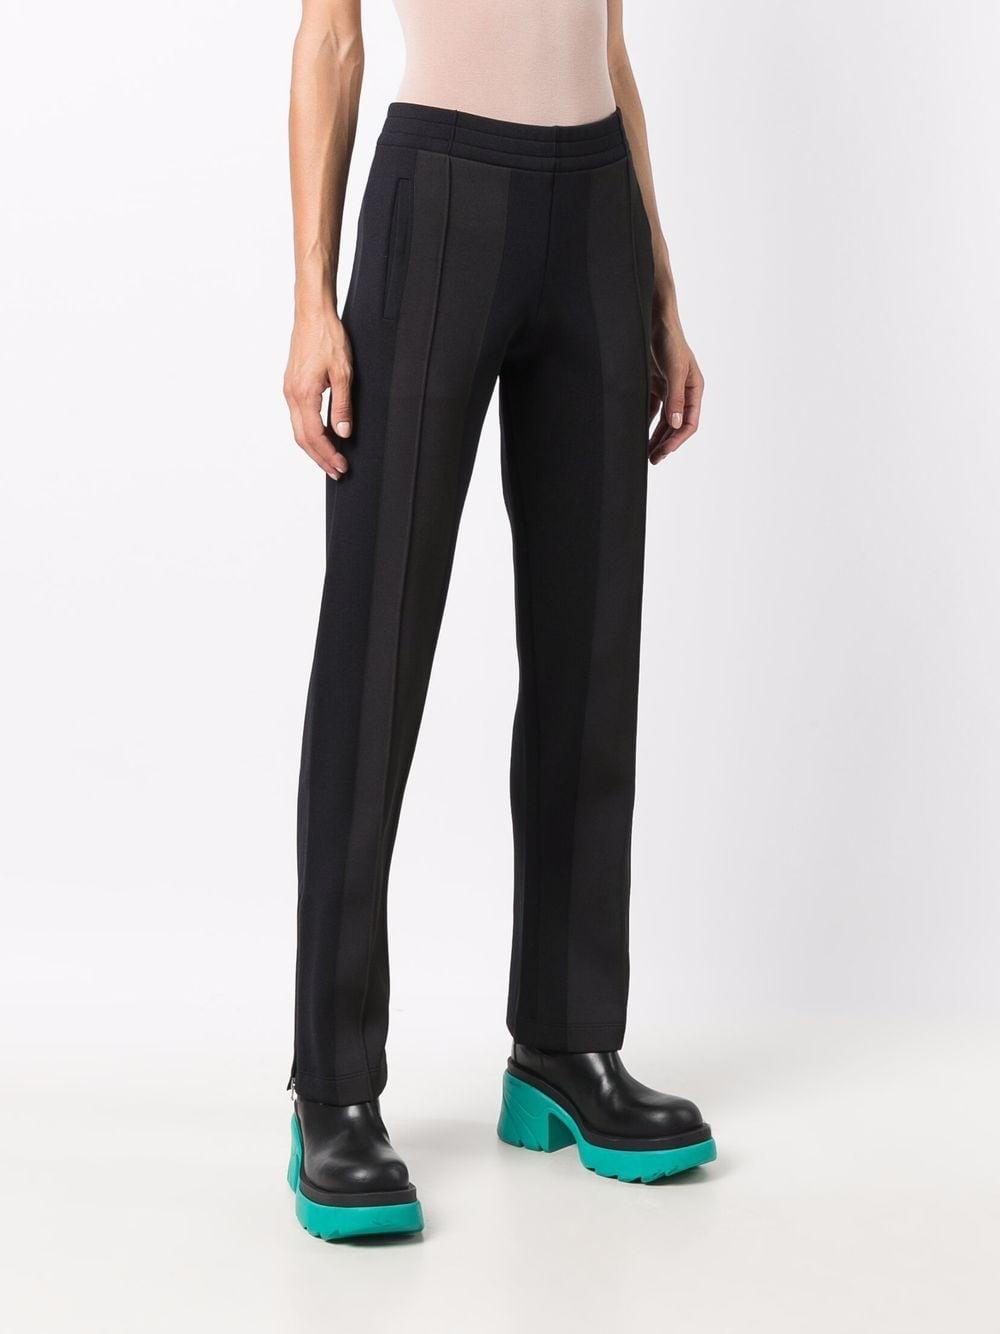 Pantalone sportivo in tessuto tecnico blu e grigio a contrasto BOTTEGA VENETA | Pantaloni | 665300-V0C102113